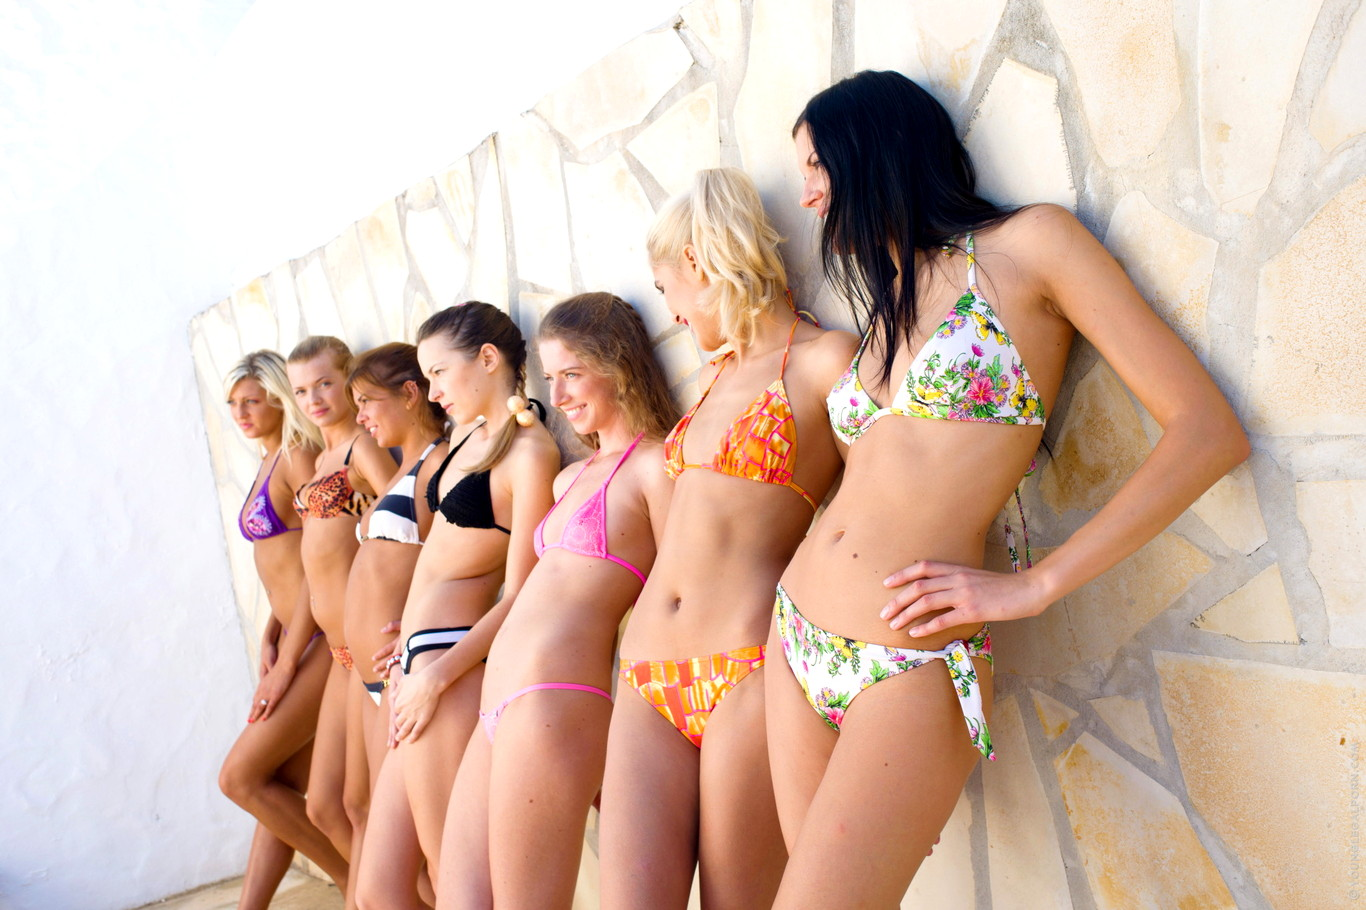 Babe Today 18 Only Girls Ivana Fukalot Sasha Blonde Stasha -1354